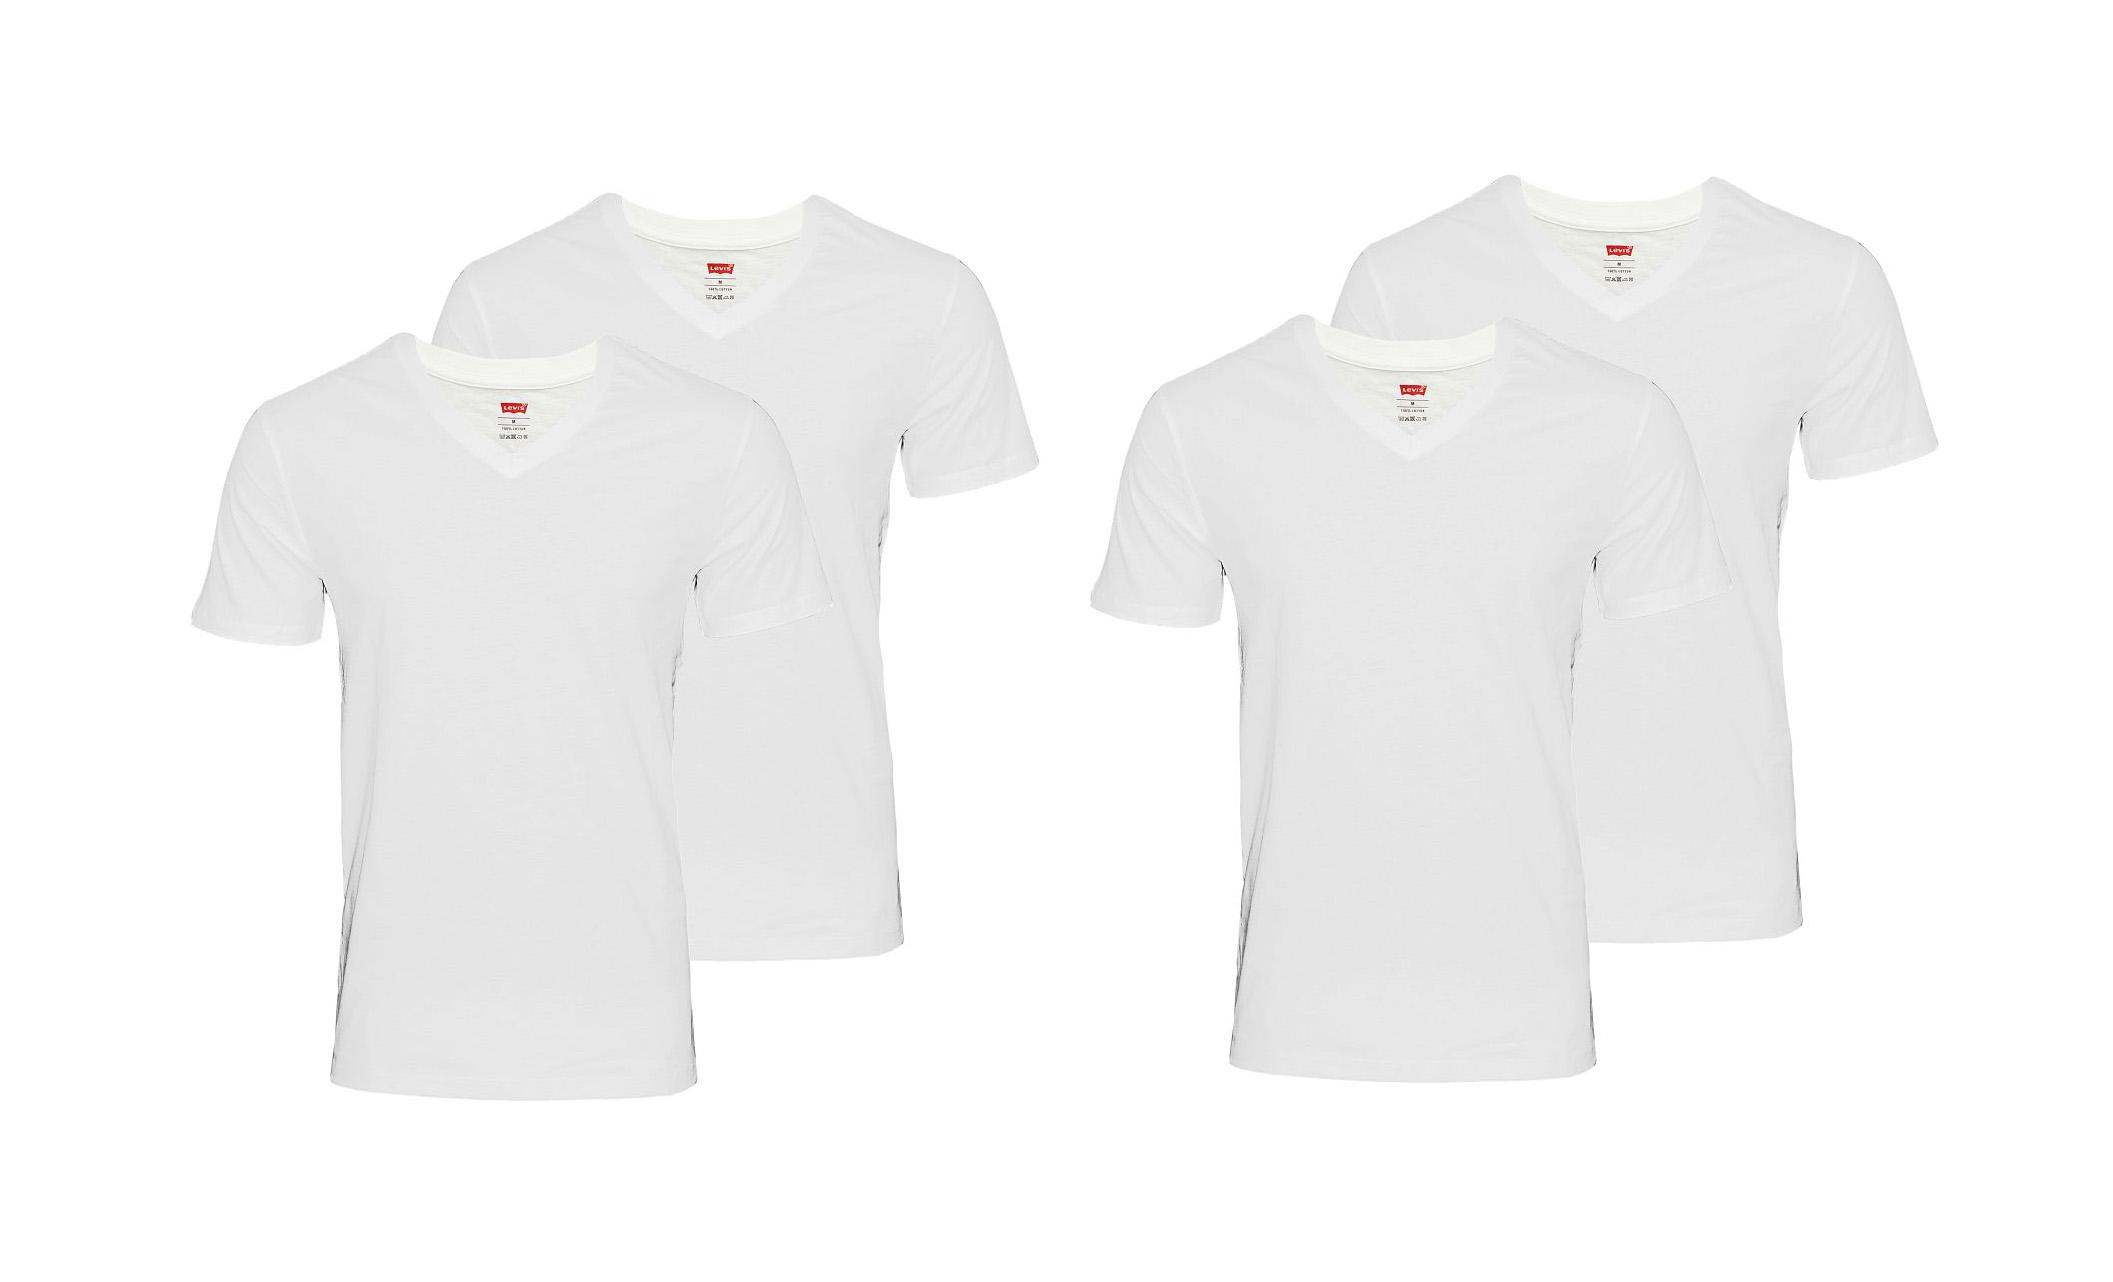 LEVIS Shirts 200SF 2 x 2er Pack T-Shirt 945004001 300 White SF17-LVSS2